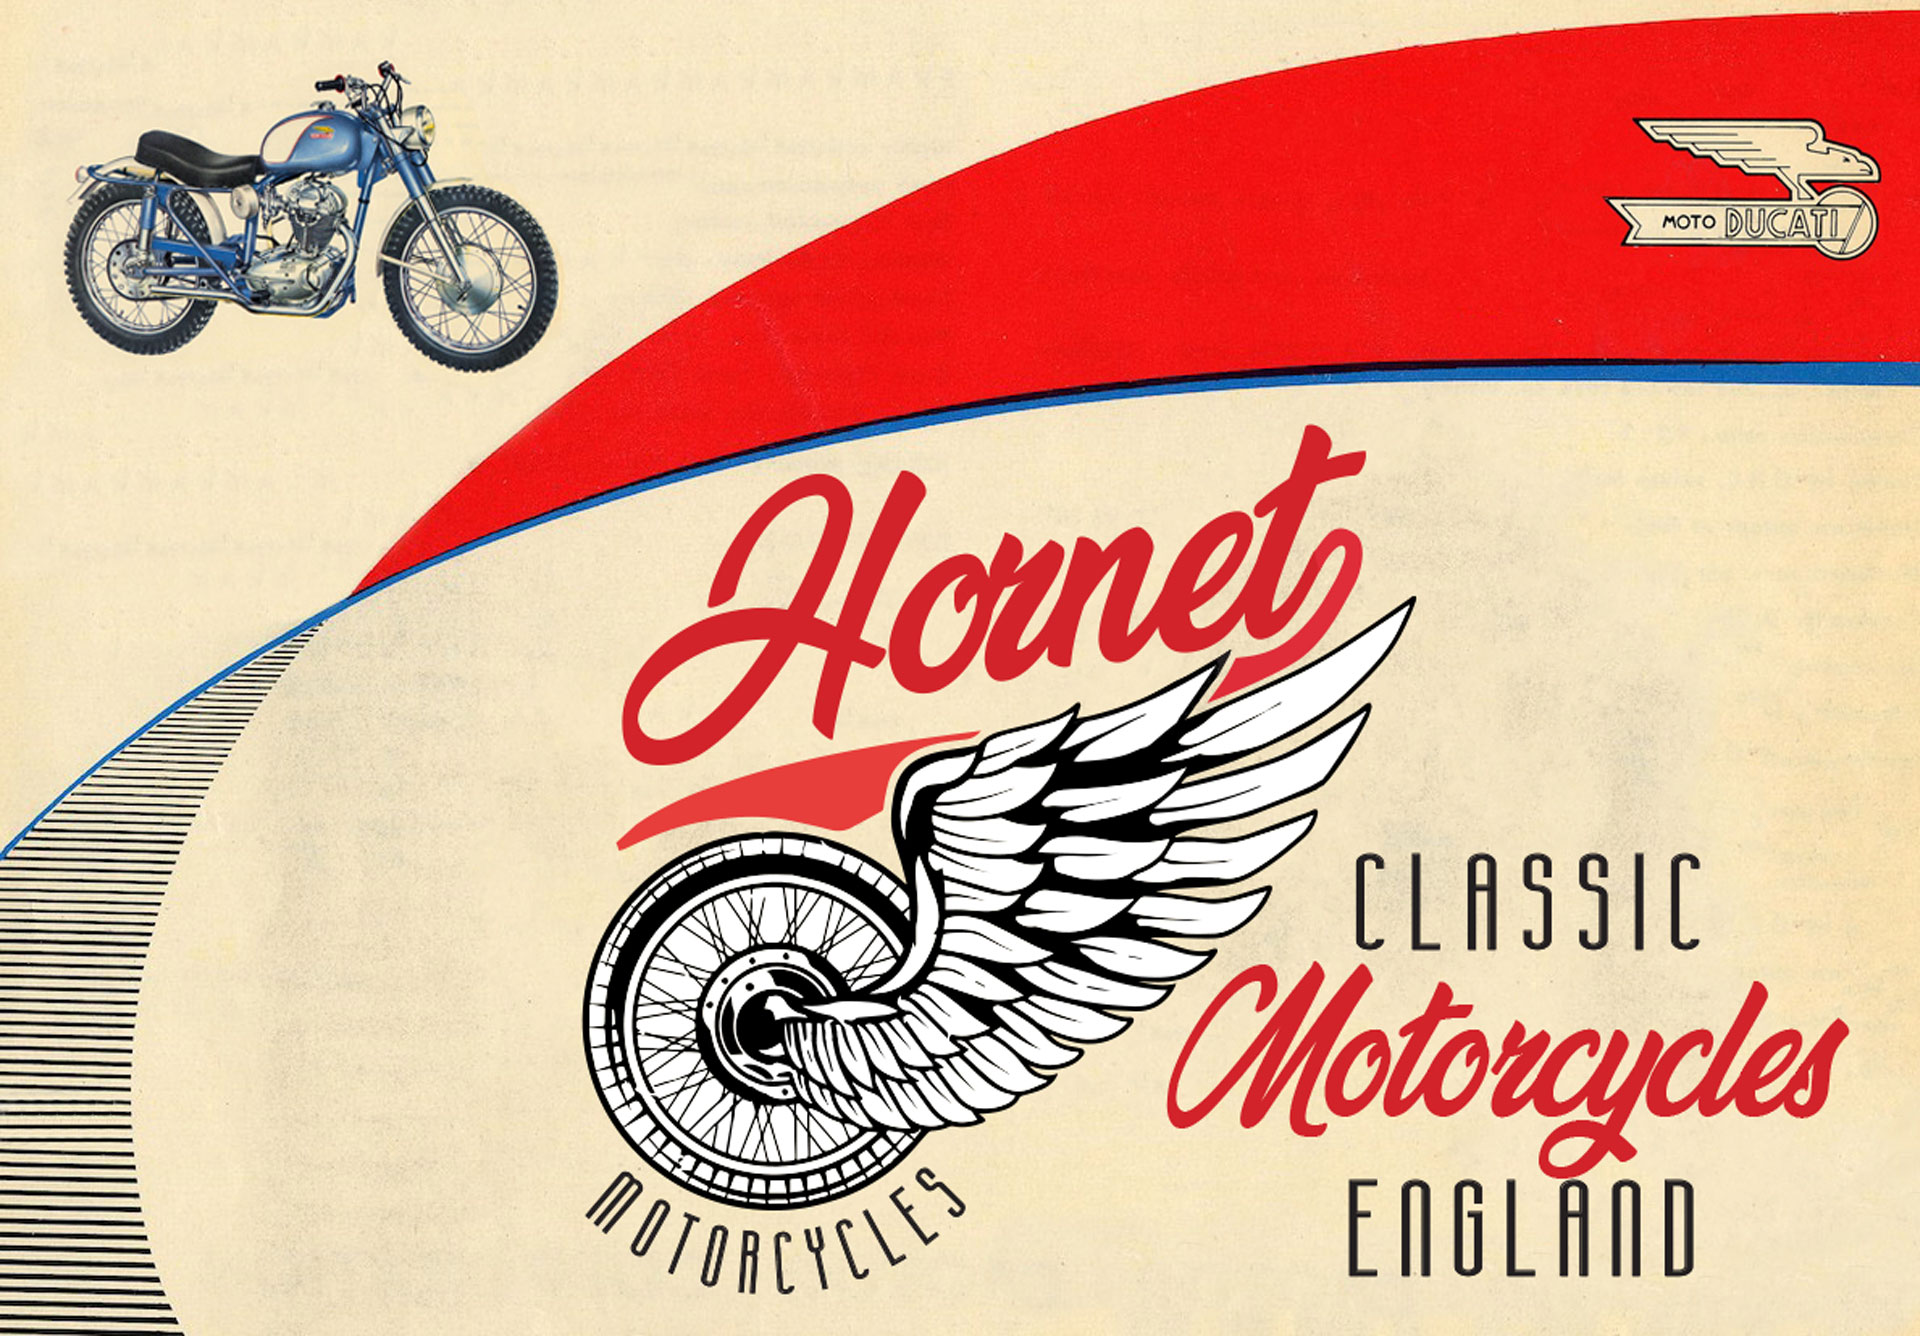 Hornet Motorcycles